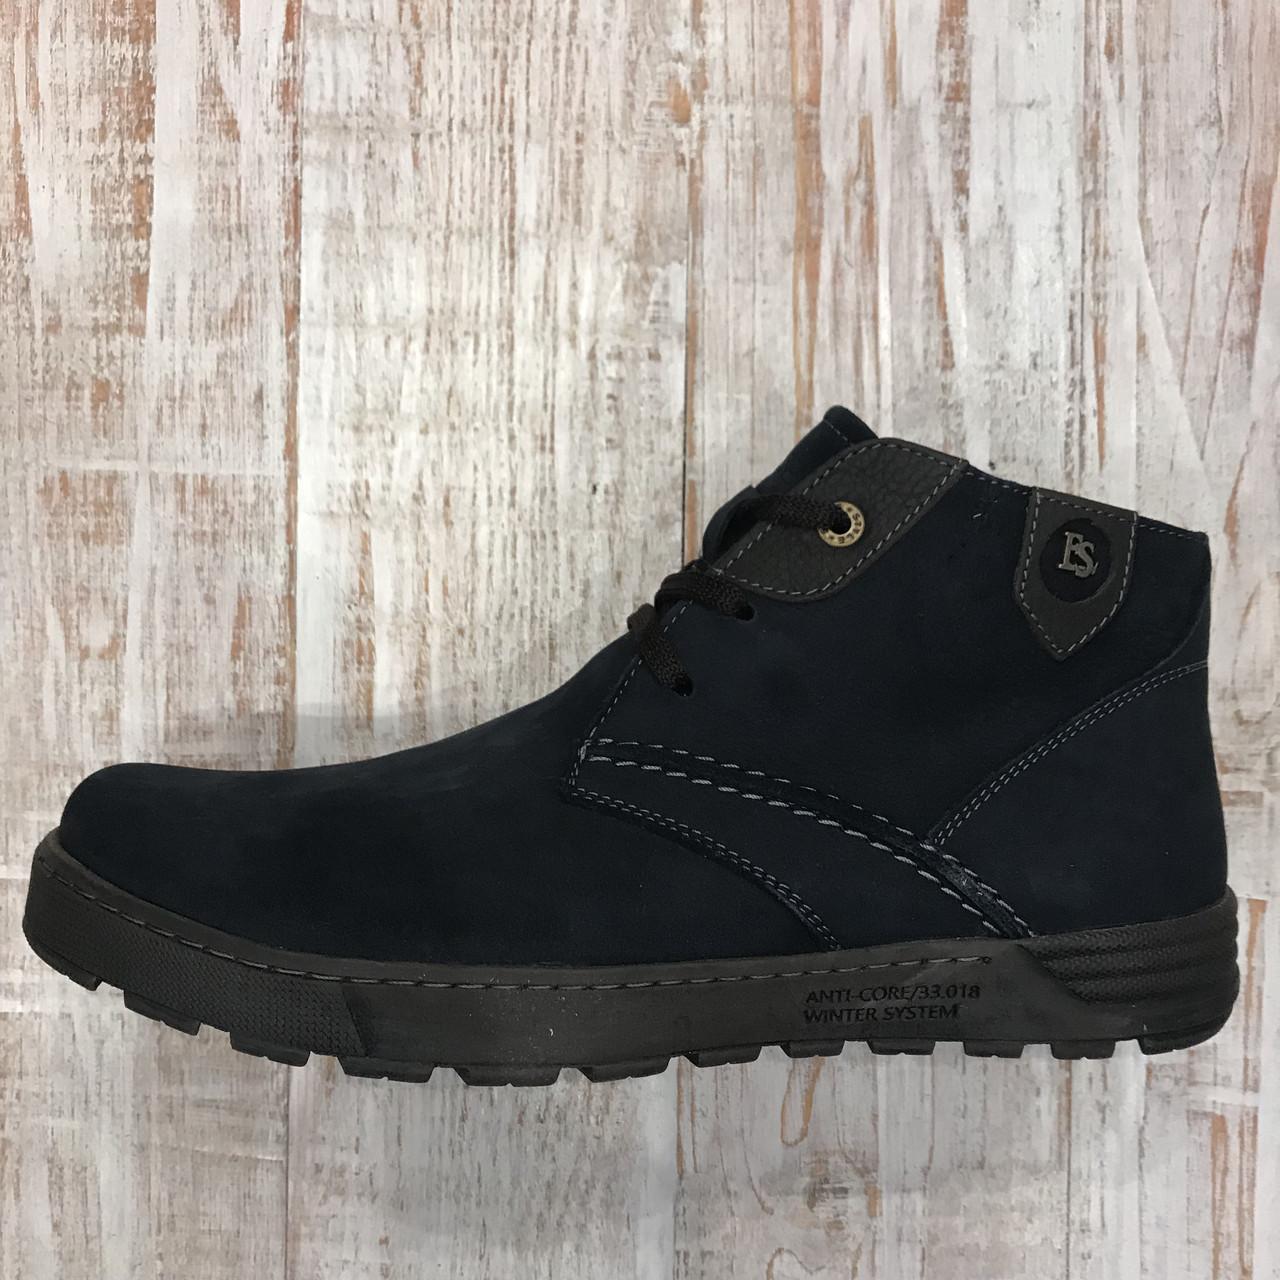 Зимние ботинки из нубука 42 размер  продажа f7e291f334211